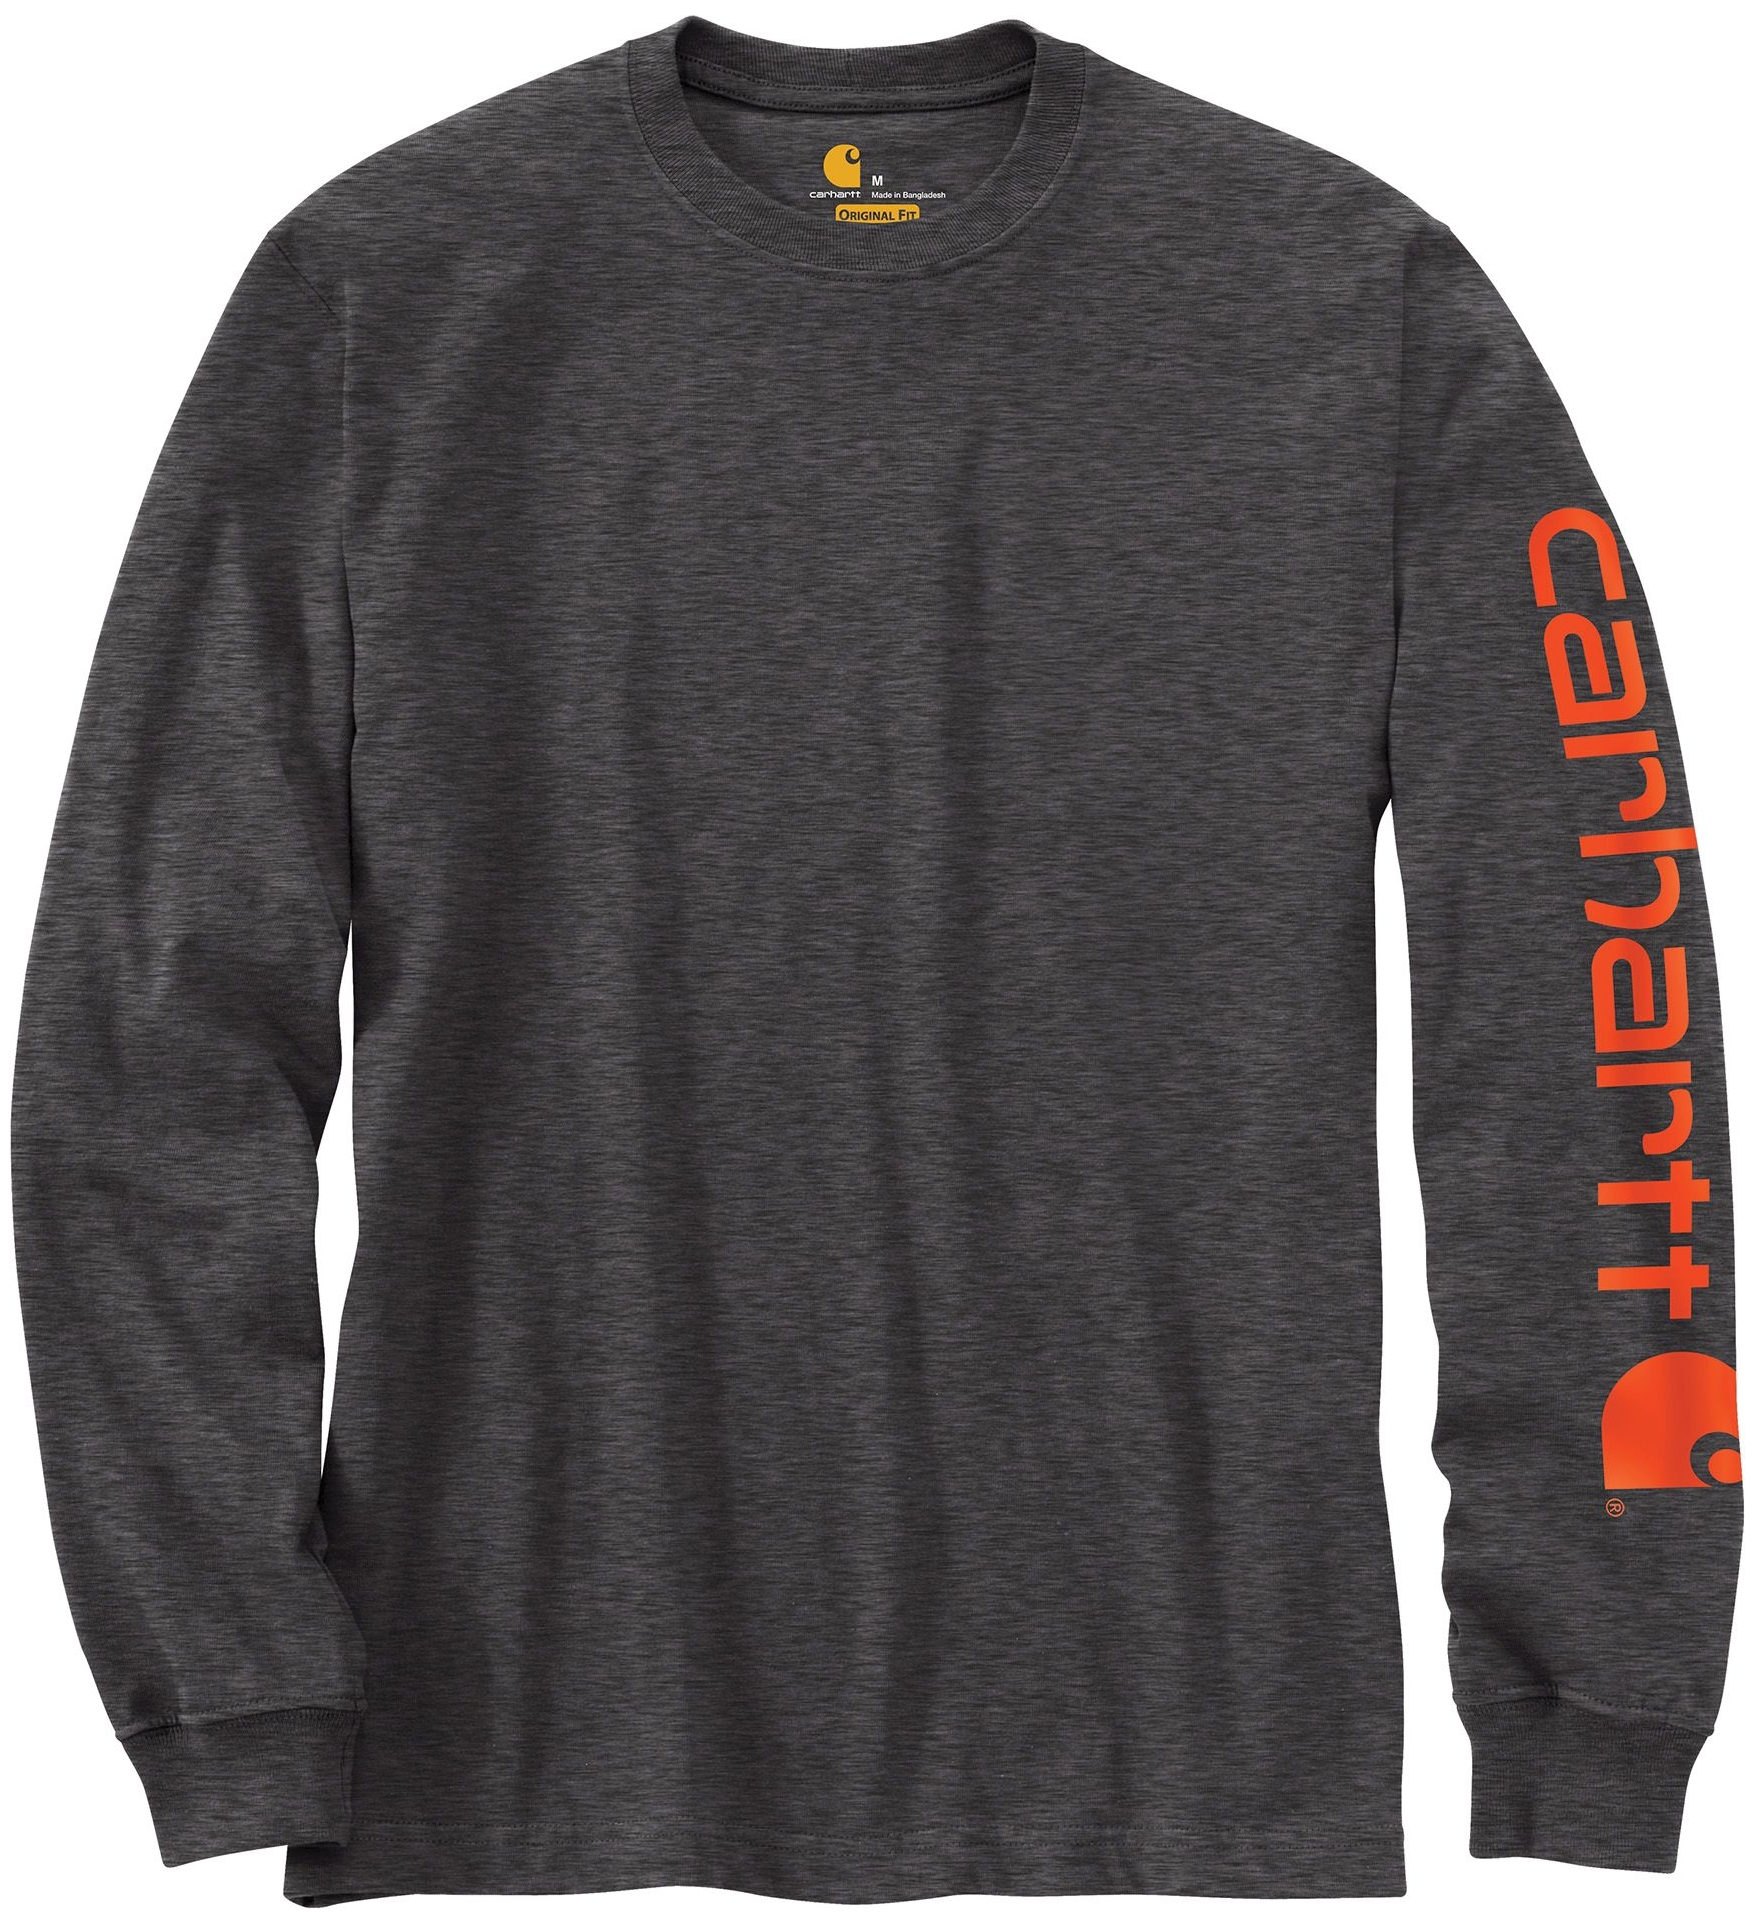 Carhartt Men's Graphic Logo Long Sleeve Shirt (Carbon Hea...